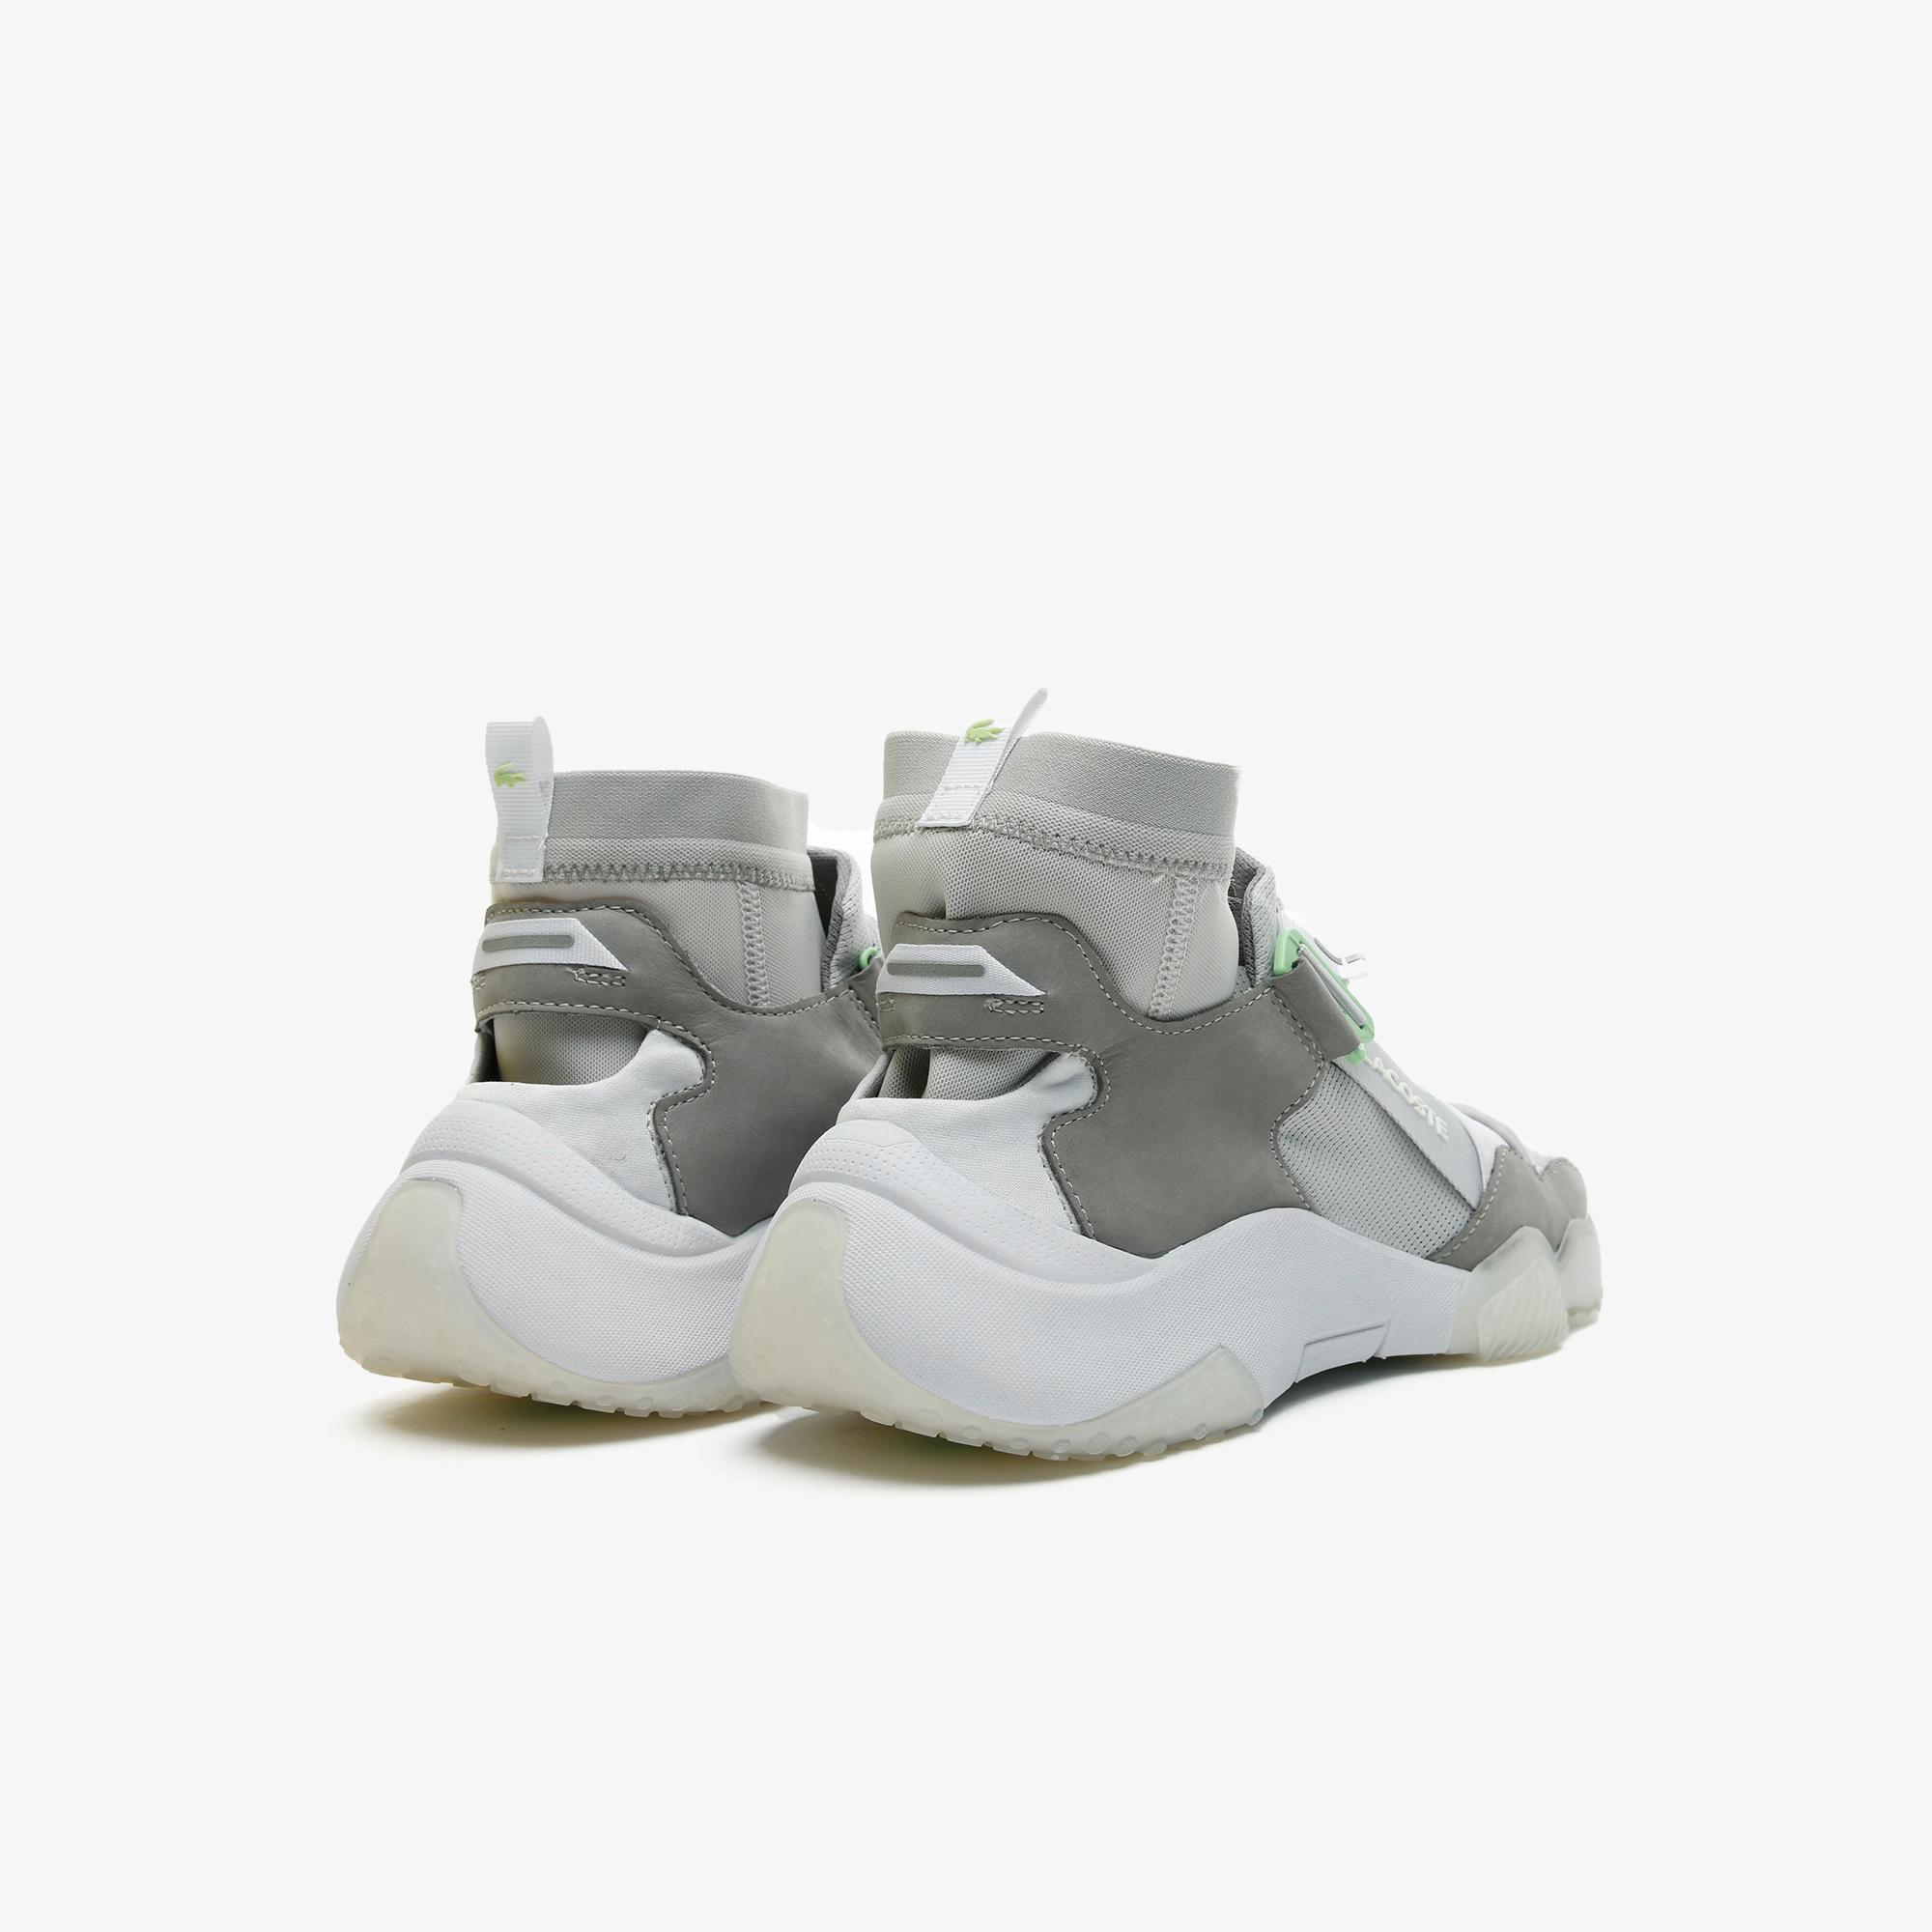 Lacoste Ut-Lt Modular 0721 1 Sma Erkek Gri - Beyaz Sneaker